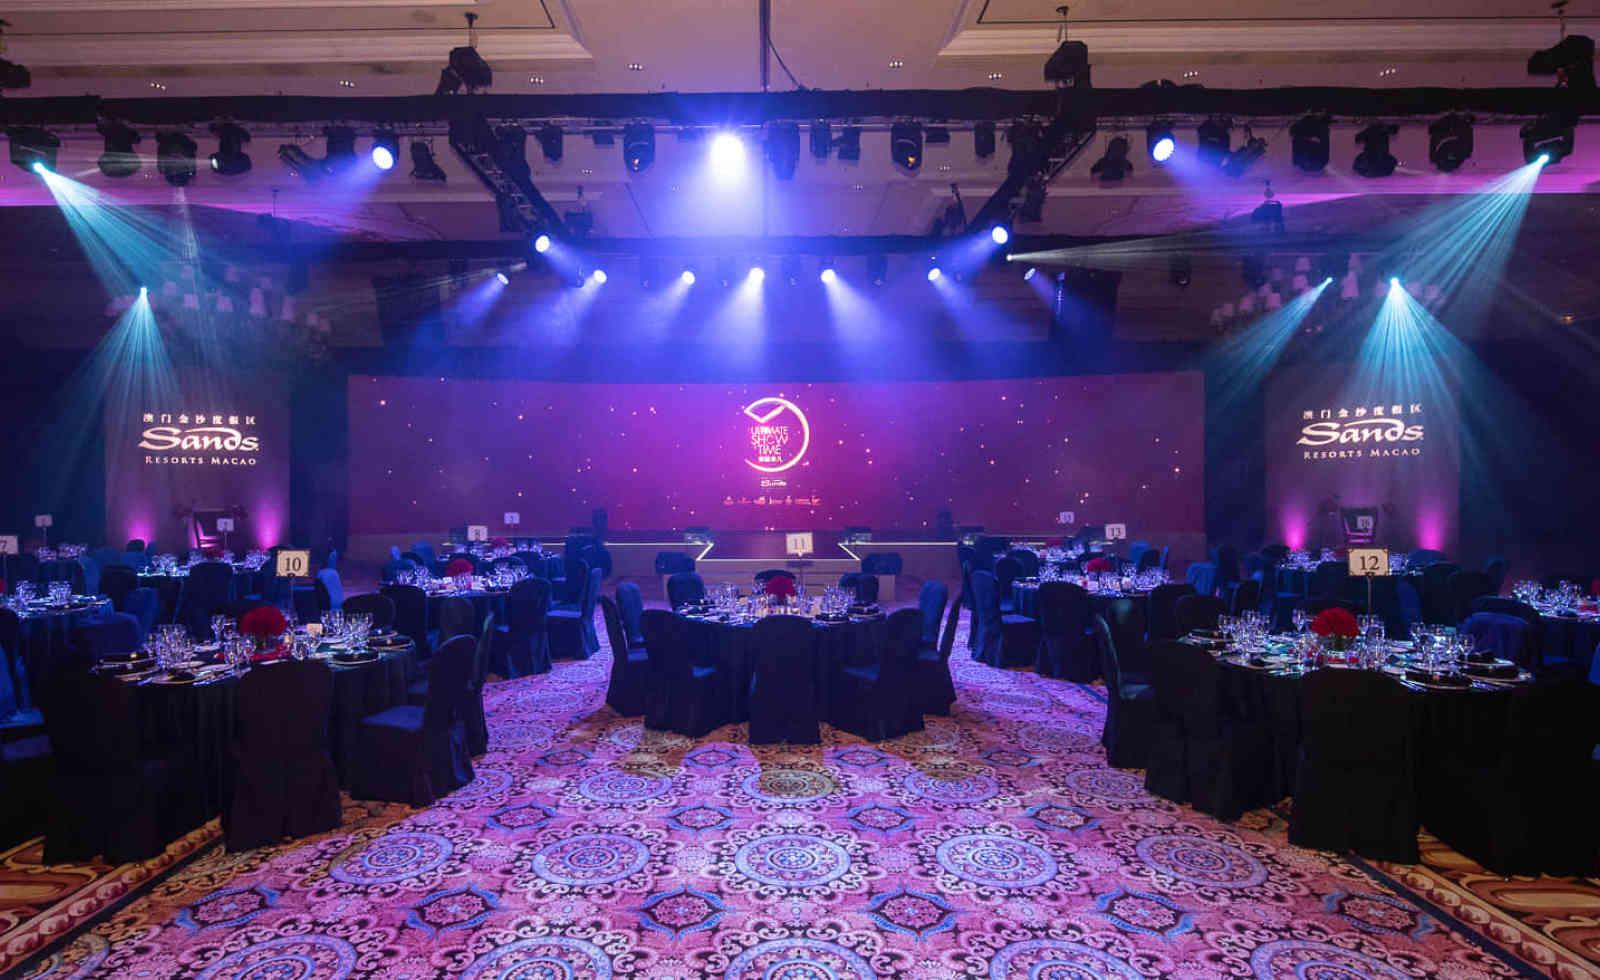 The Venetian Macao's pillar-less ballroom